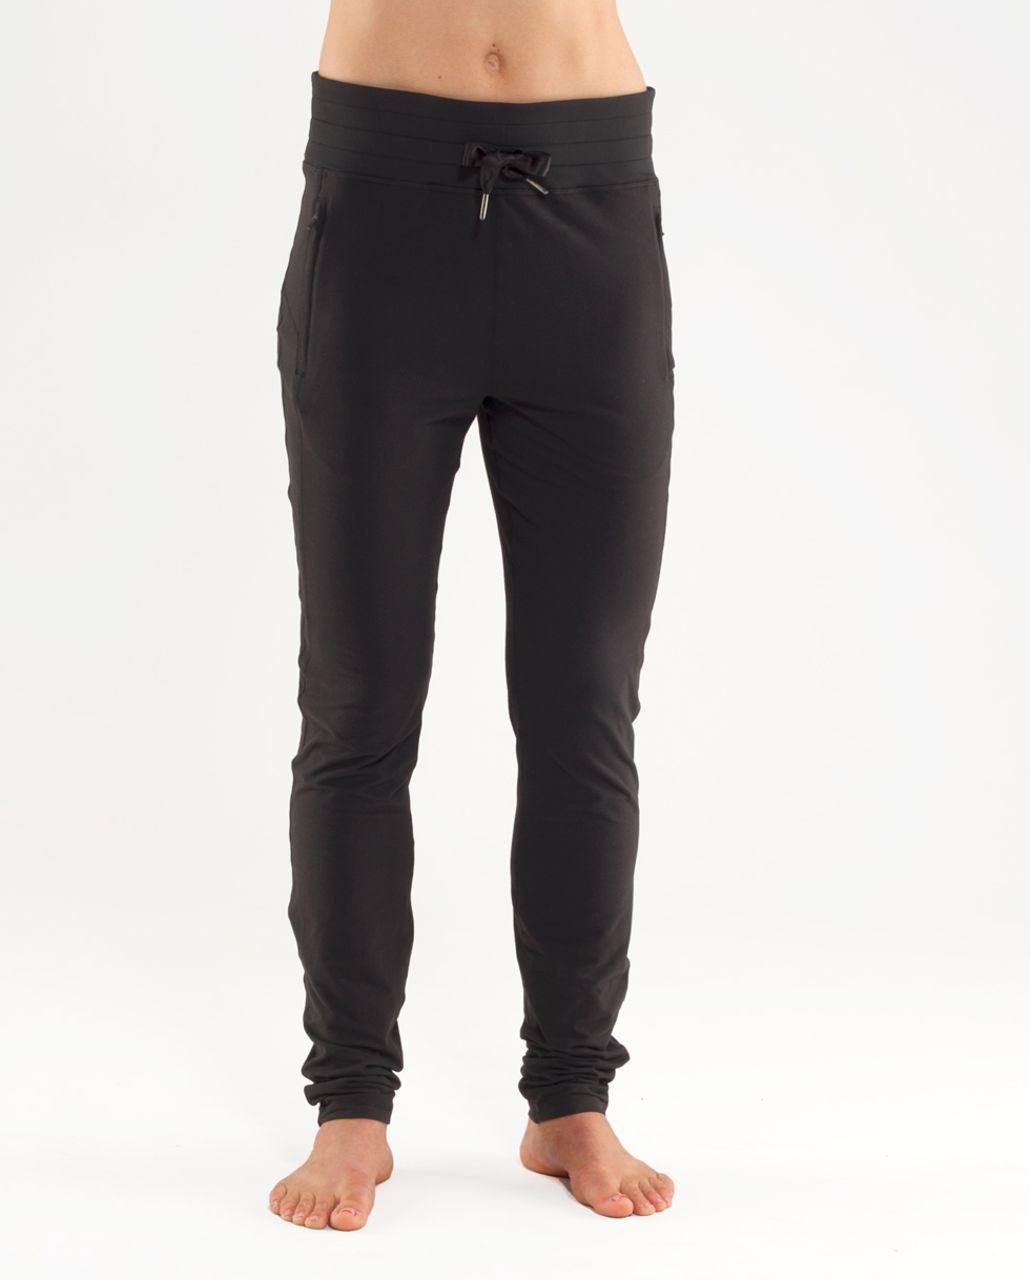 Lululemon Hang Loose Pant - Black